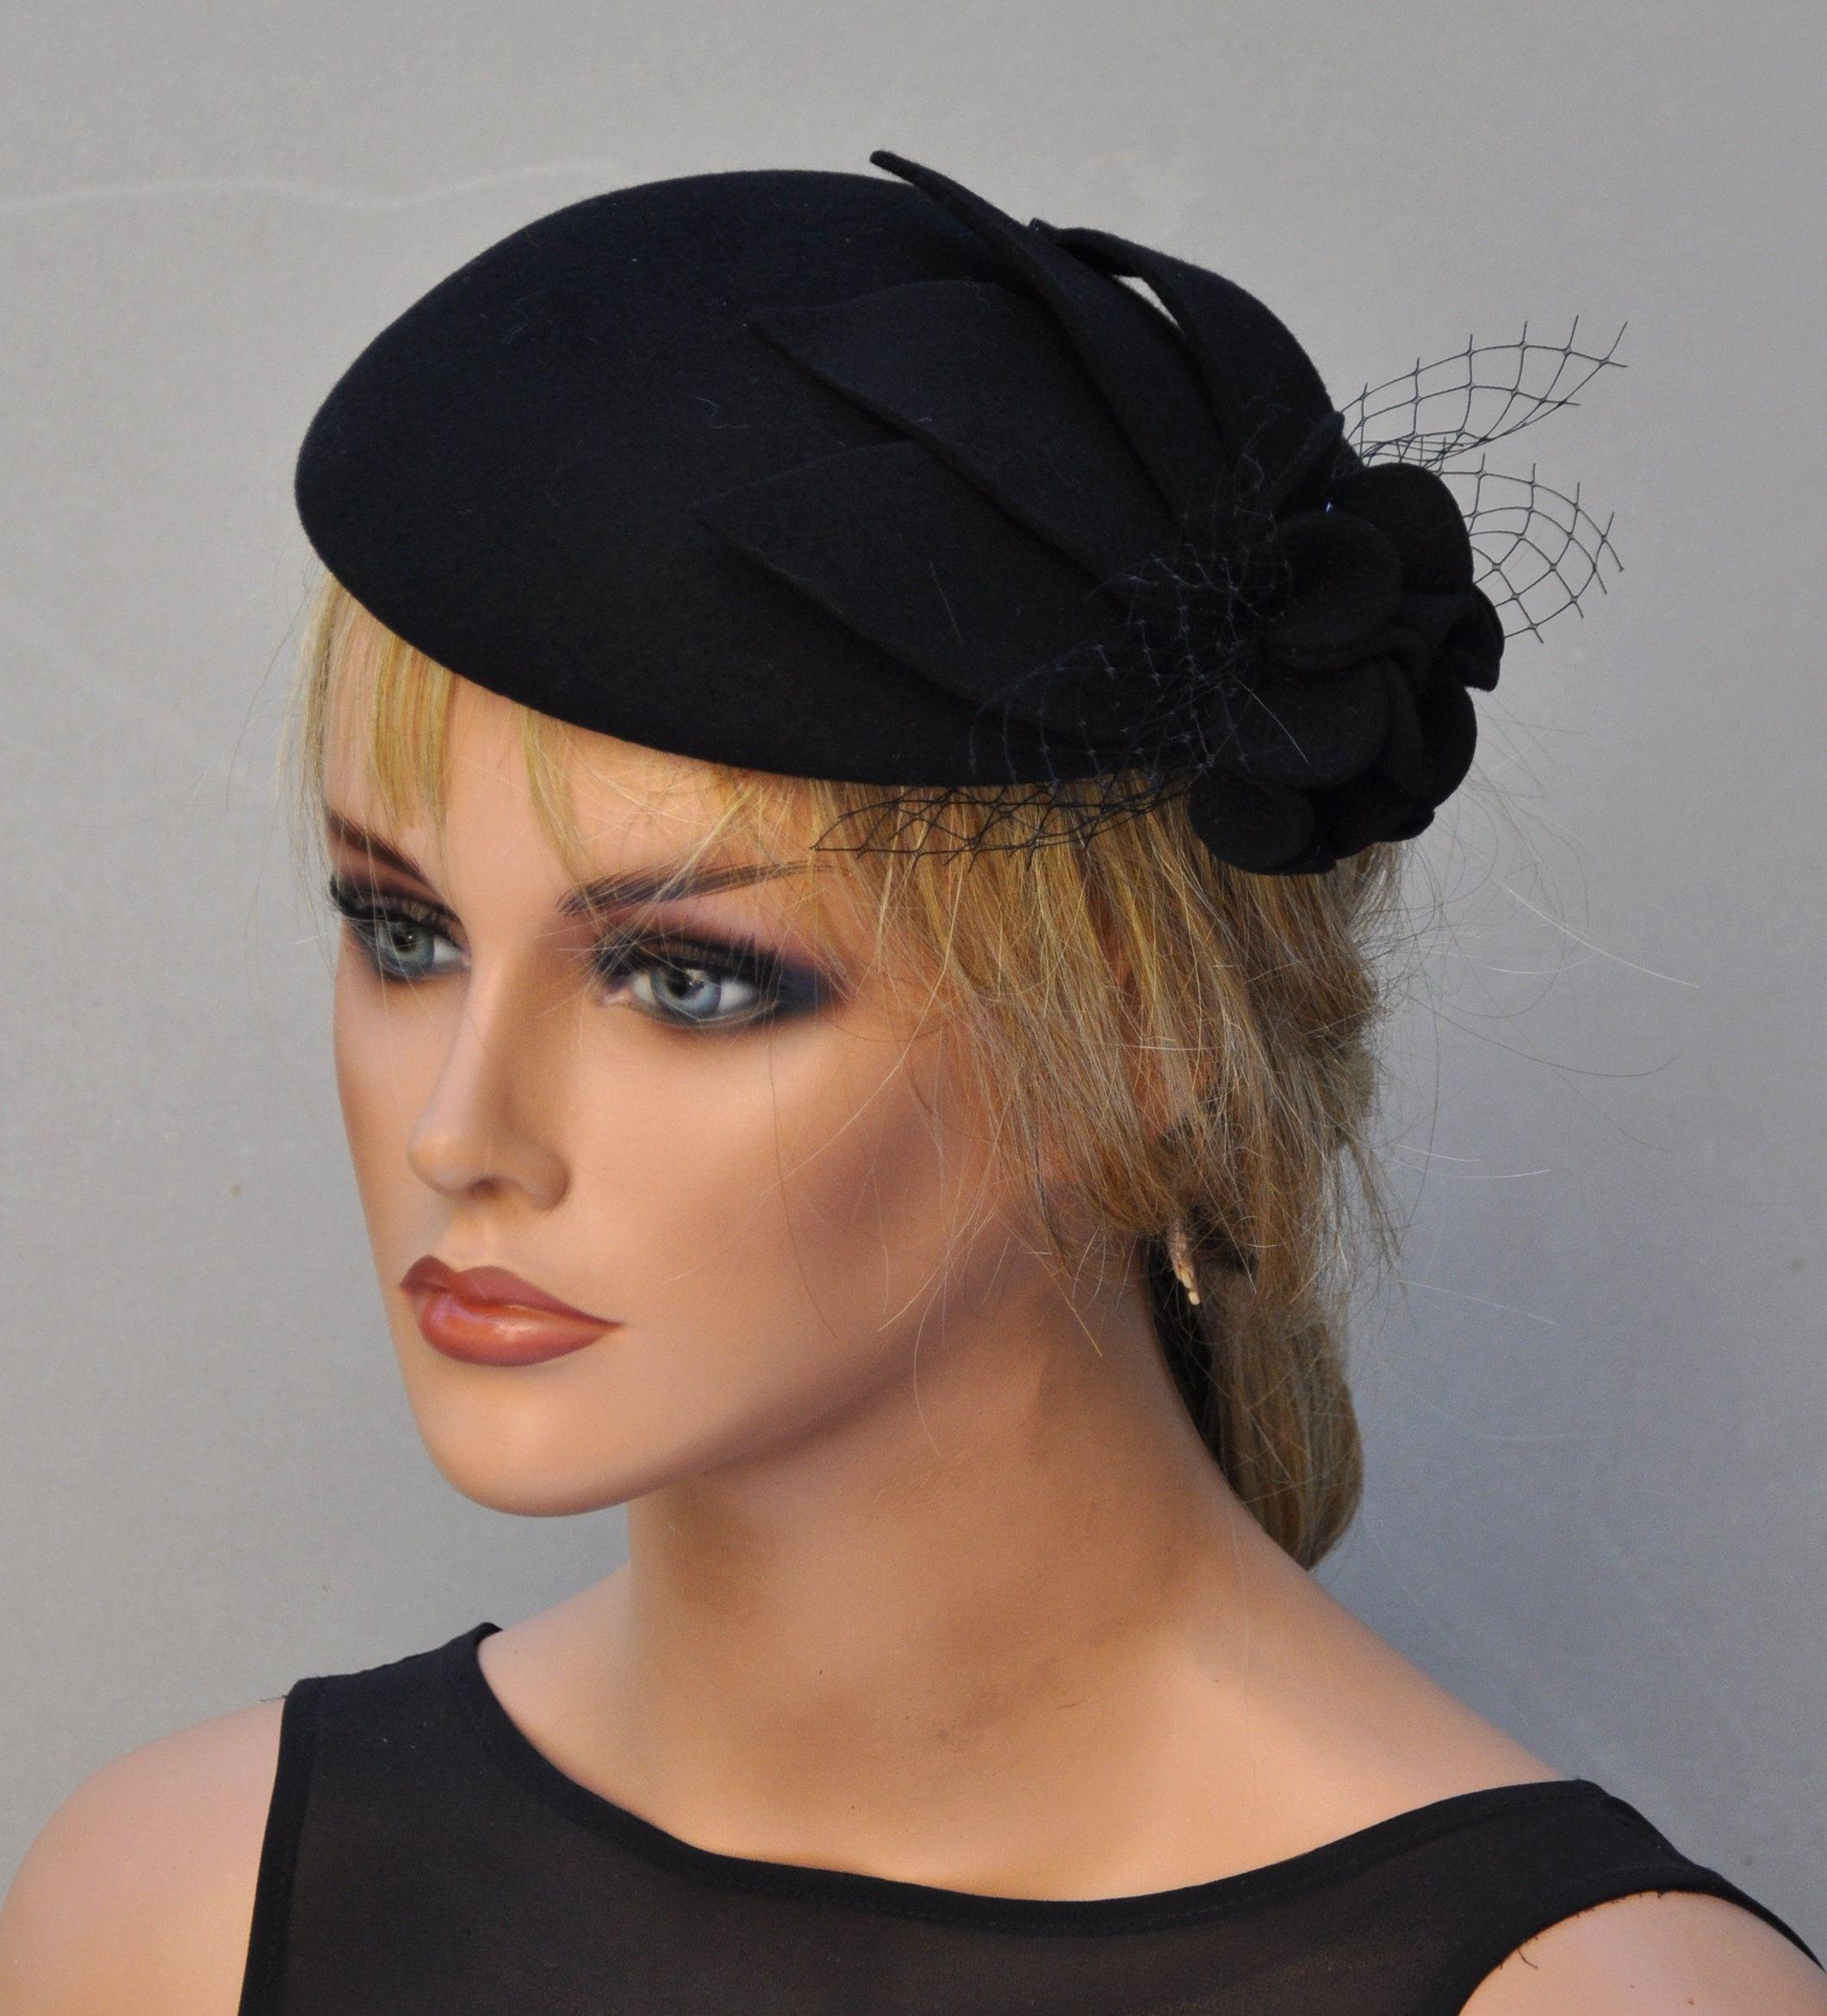 ae0ba4ee1 Fascinator Cocktail Hat, Ladies Black Winter Hat, Church Hat, Formal Hat, Pillbox  Hat, Funeral Hat, Women's Black Hat